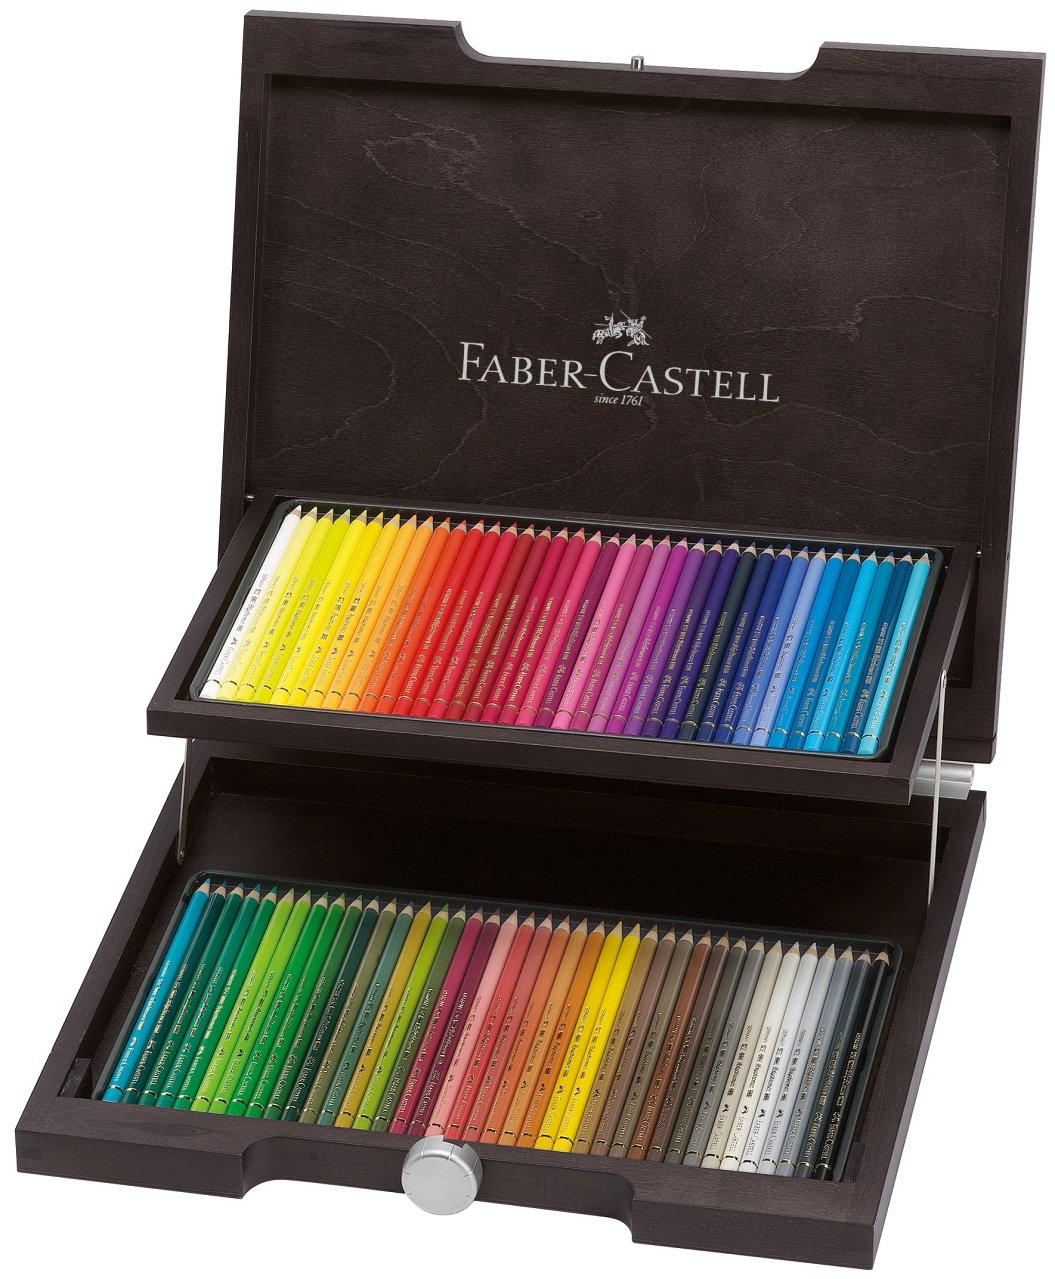 Polychromos 72 Pencil Wood Box Set by Faber-Castell